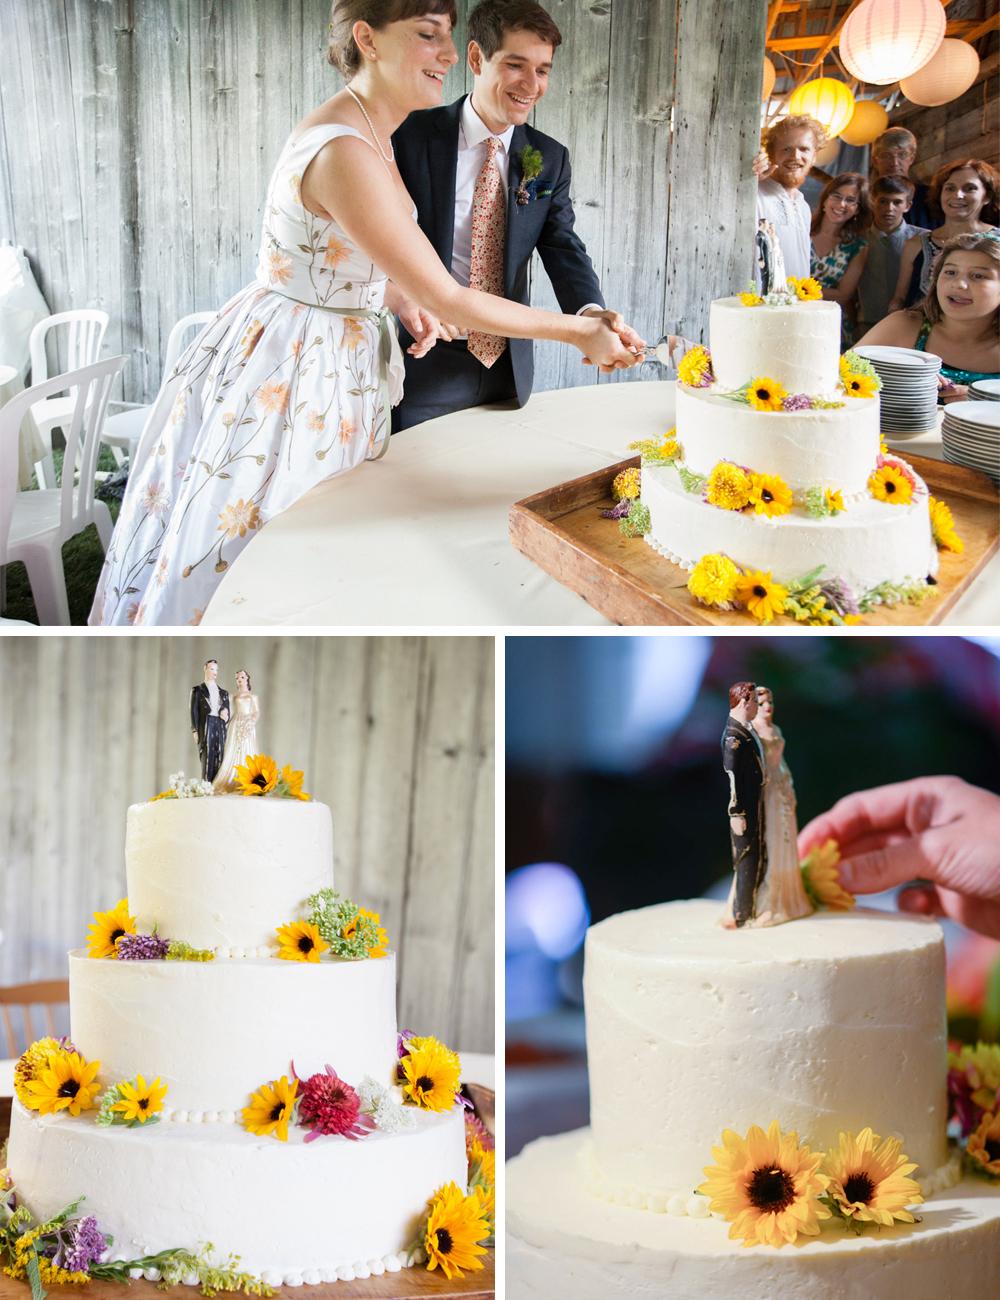 Handmade DIY wedding cake